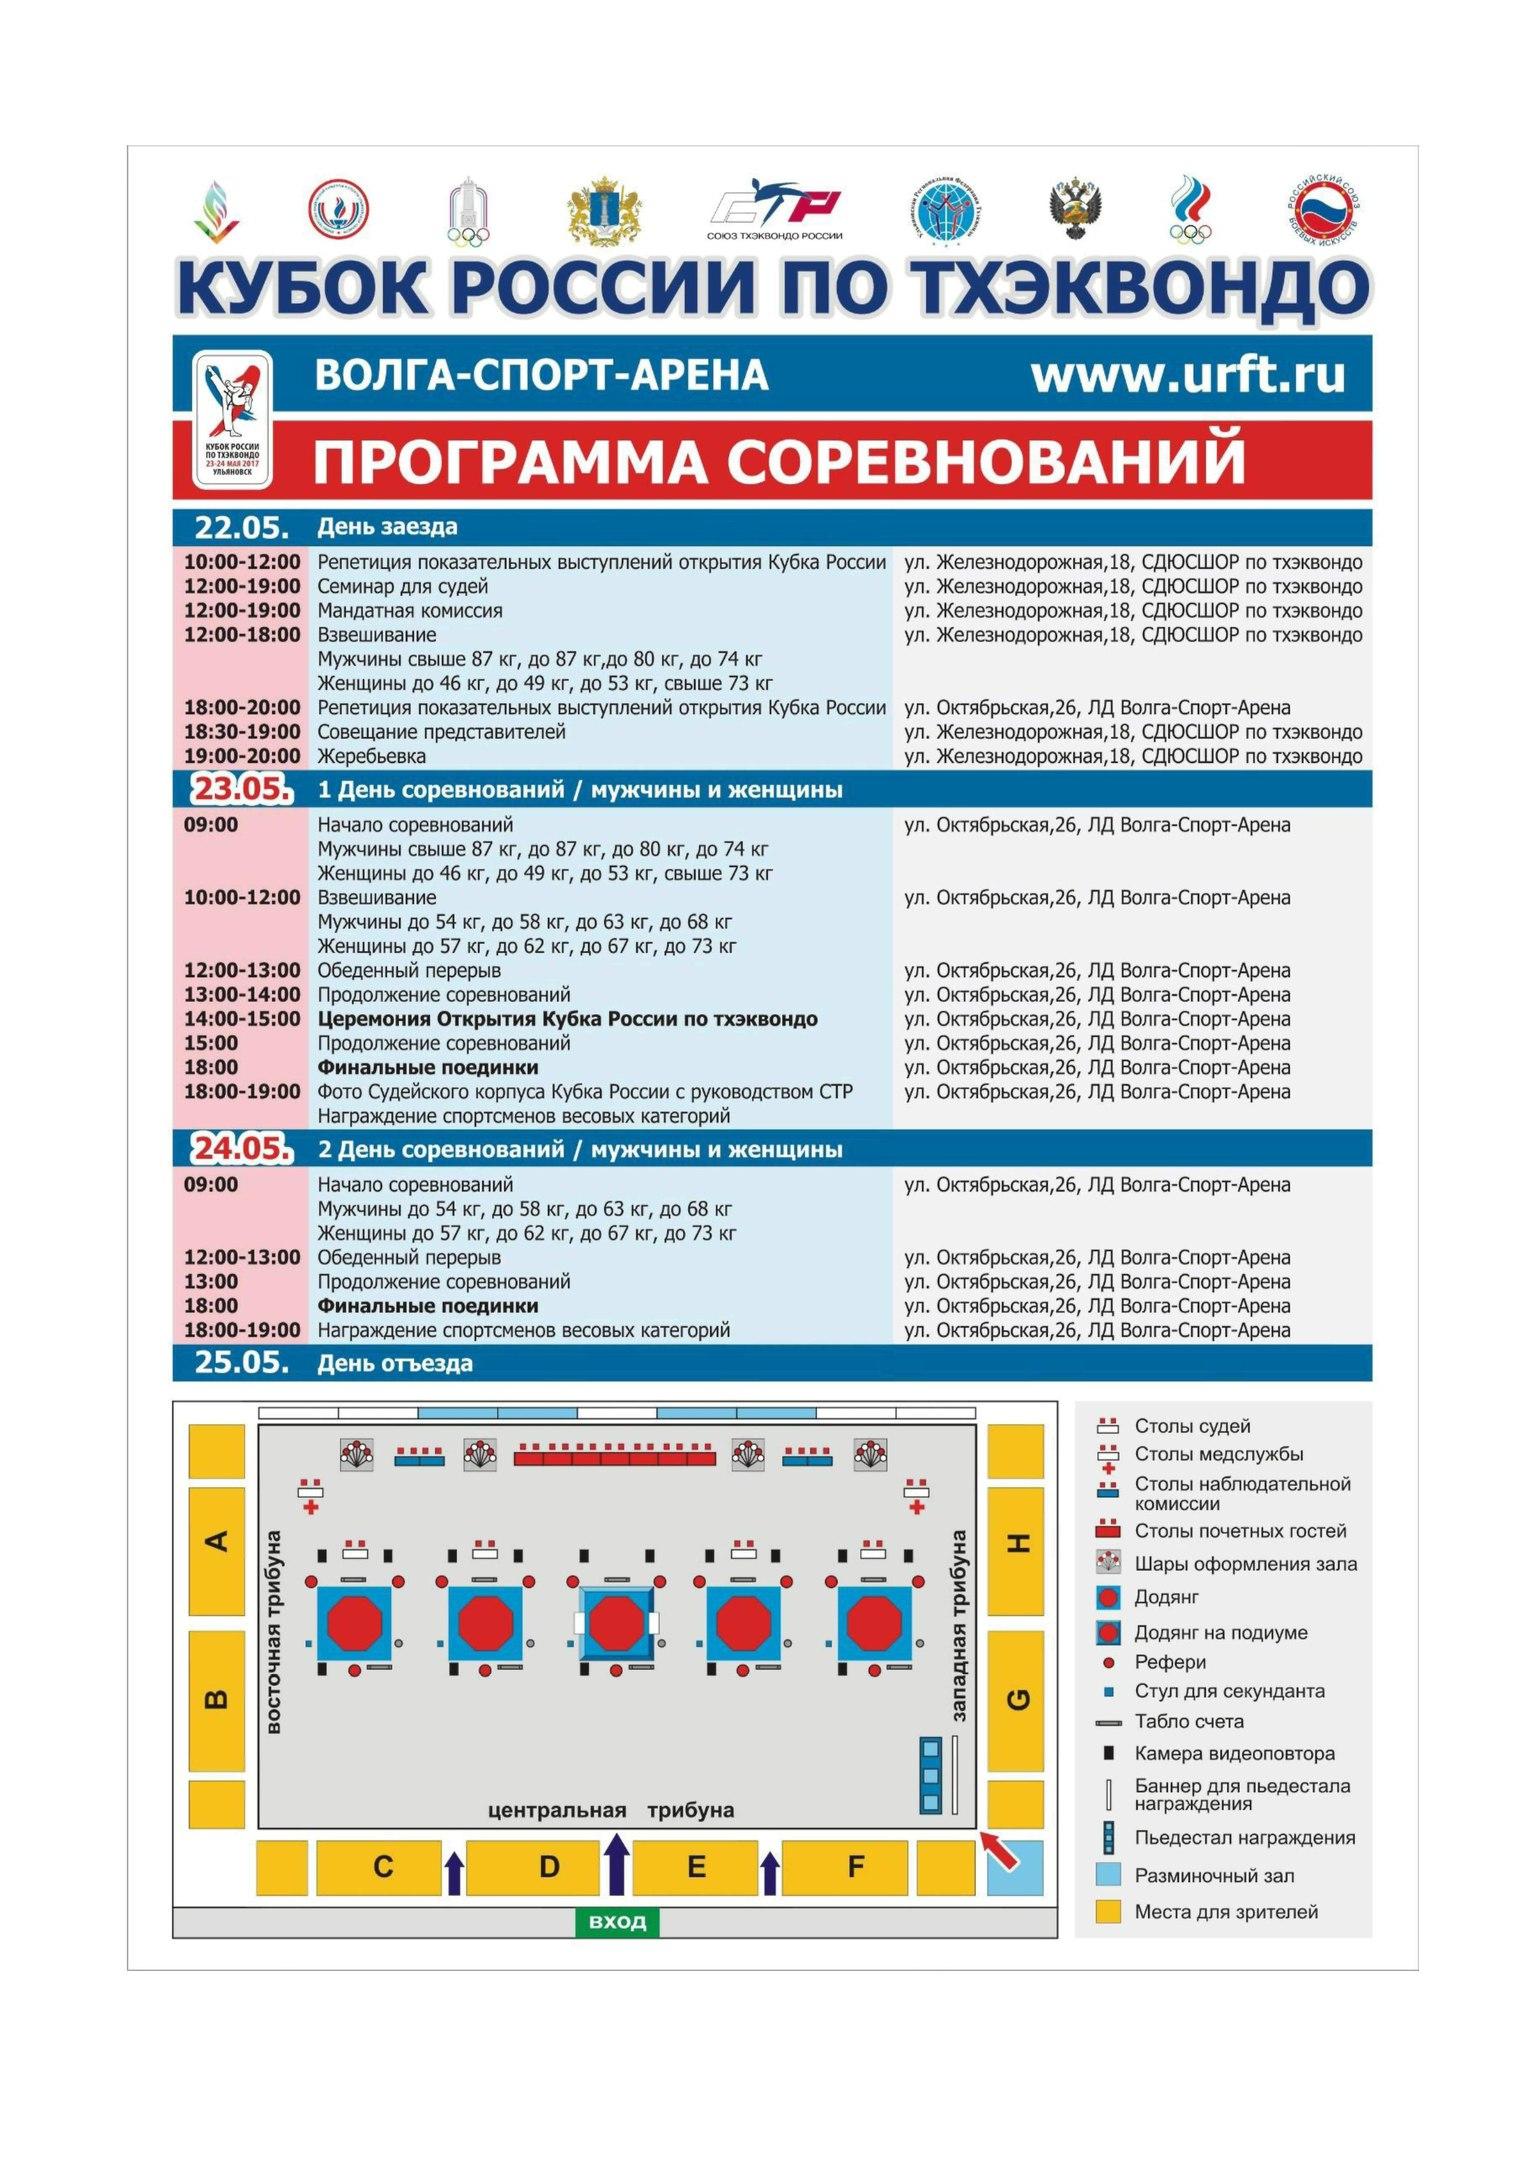 Kubok_Russia_Programma-2017